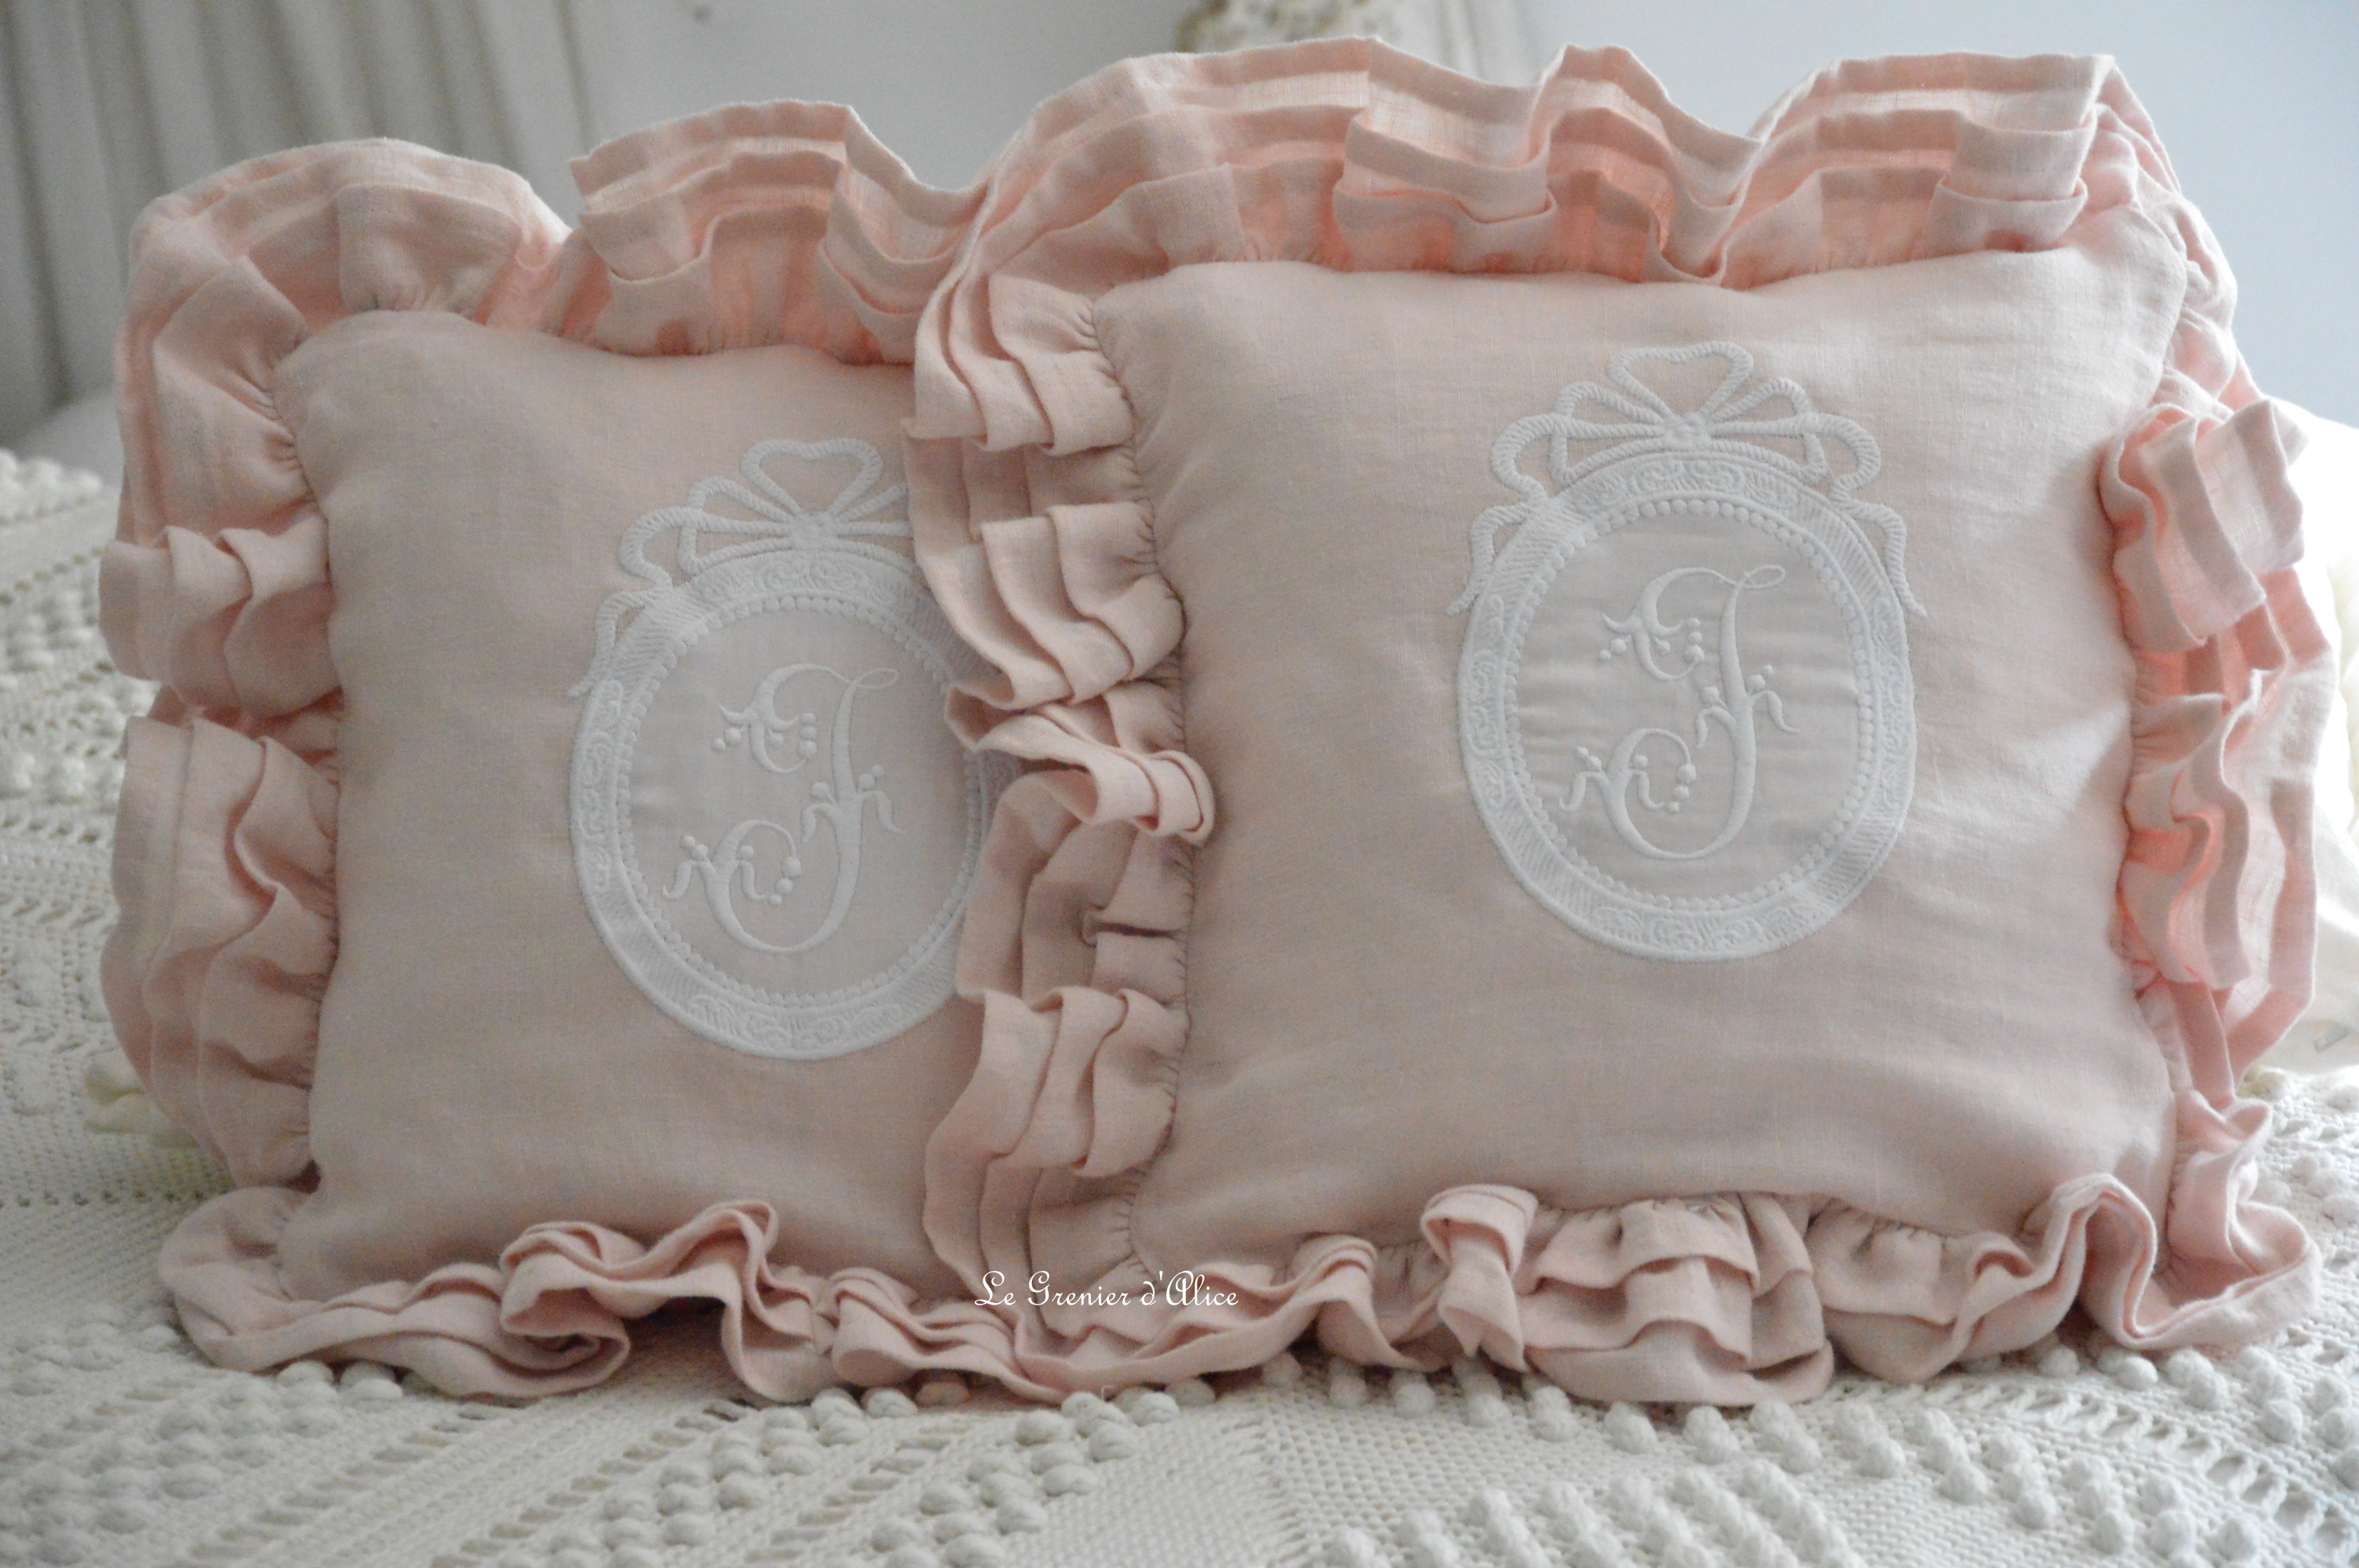 Coussin création le grenier dalice coussin romantique coussin shabby chic lin rose poudré broderie monogramme volant shabby ruffle pillow romantic pillow linen pillow